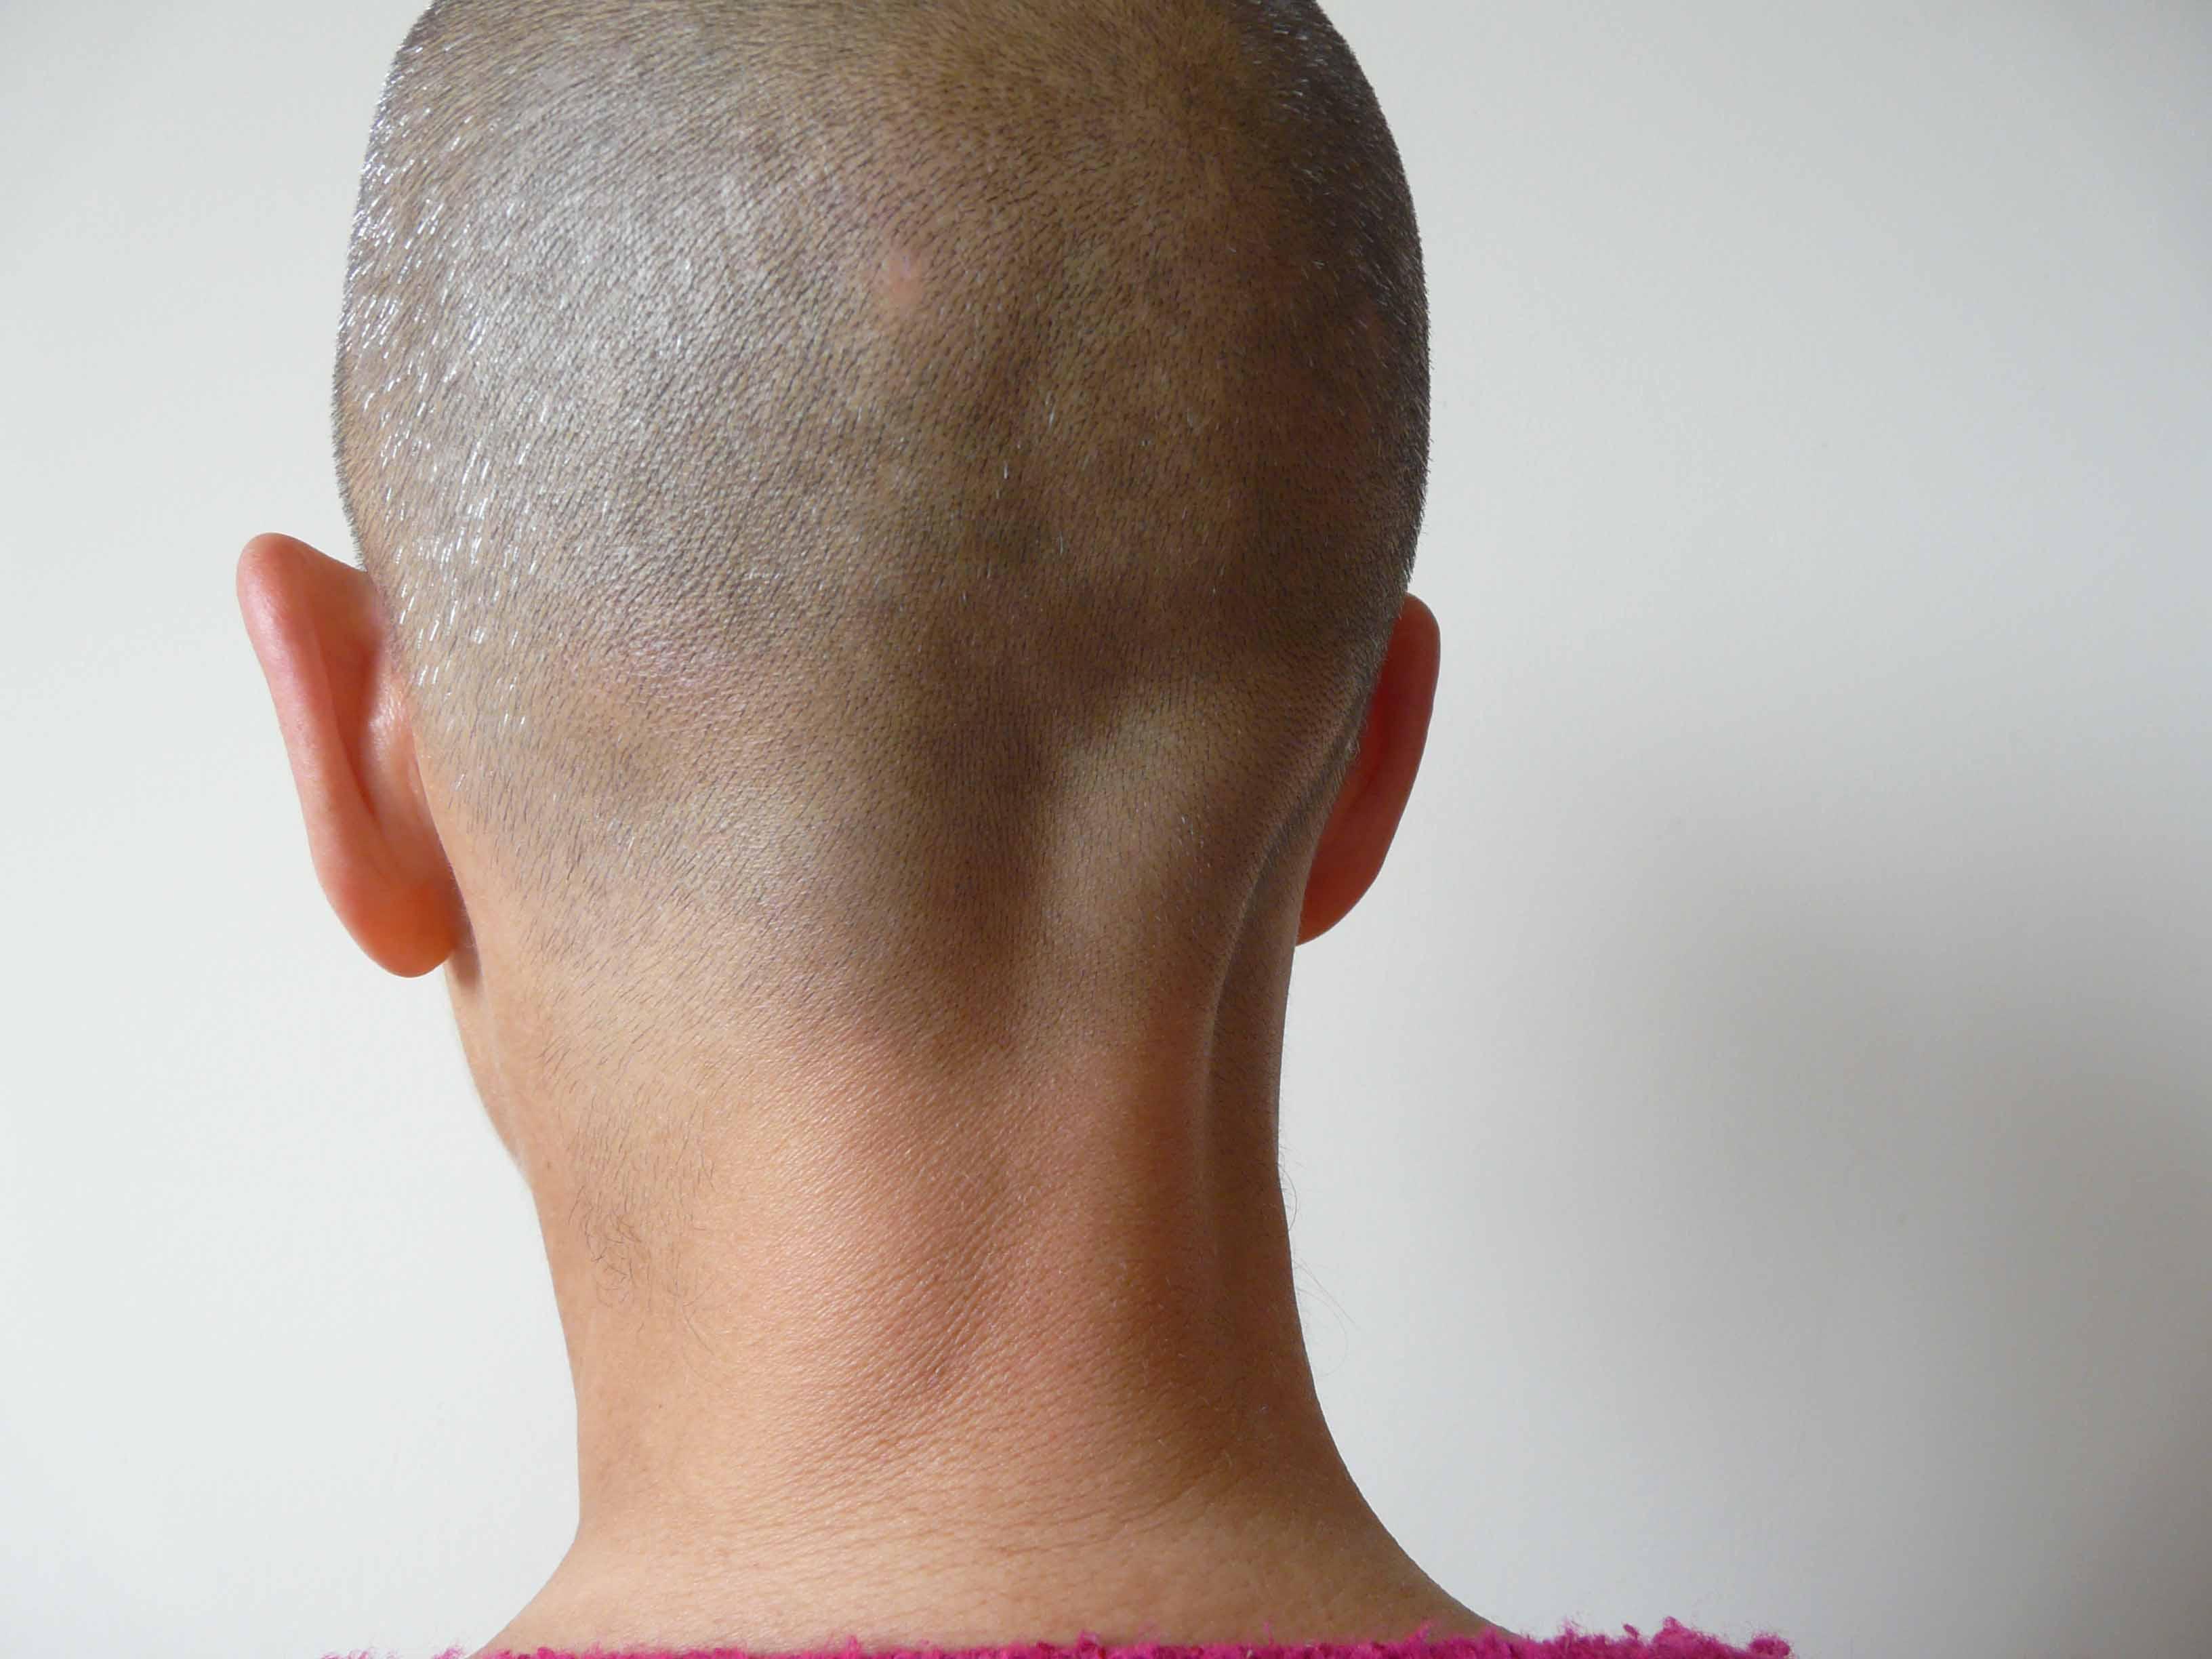 Ск порнобес сзади раком 5 фотография